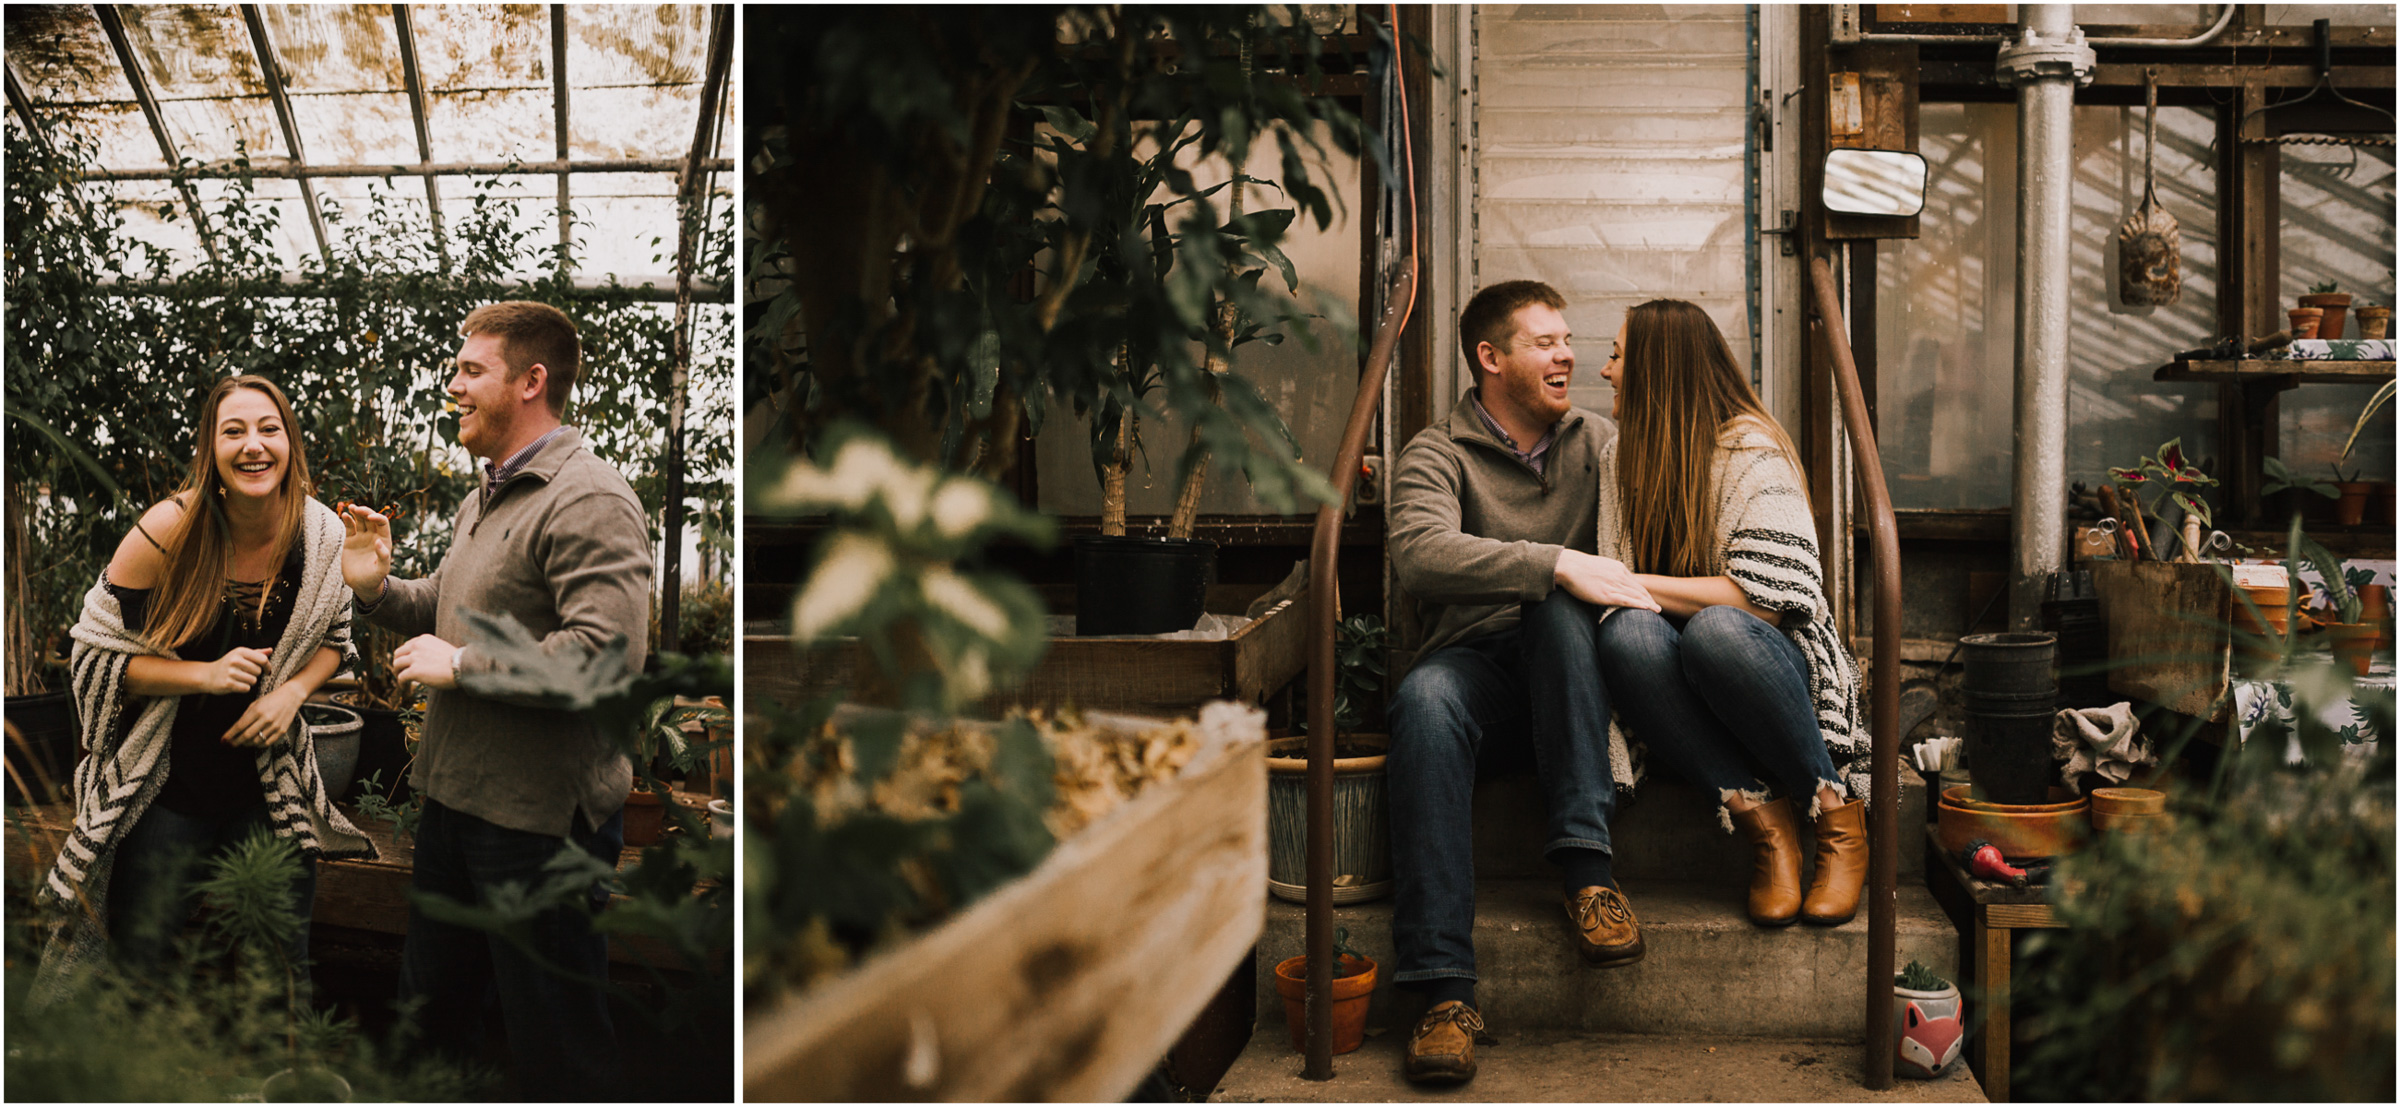 alyssa barletter photography johns greenhouse kansas city missouri brookside waldo engagement session winter-17.jpg